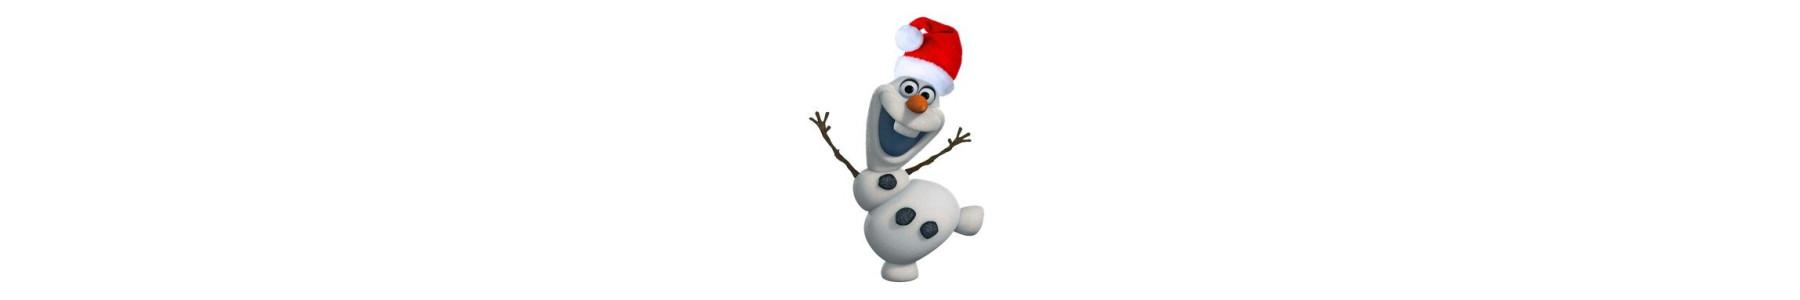 Articole party Olaf Christmas